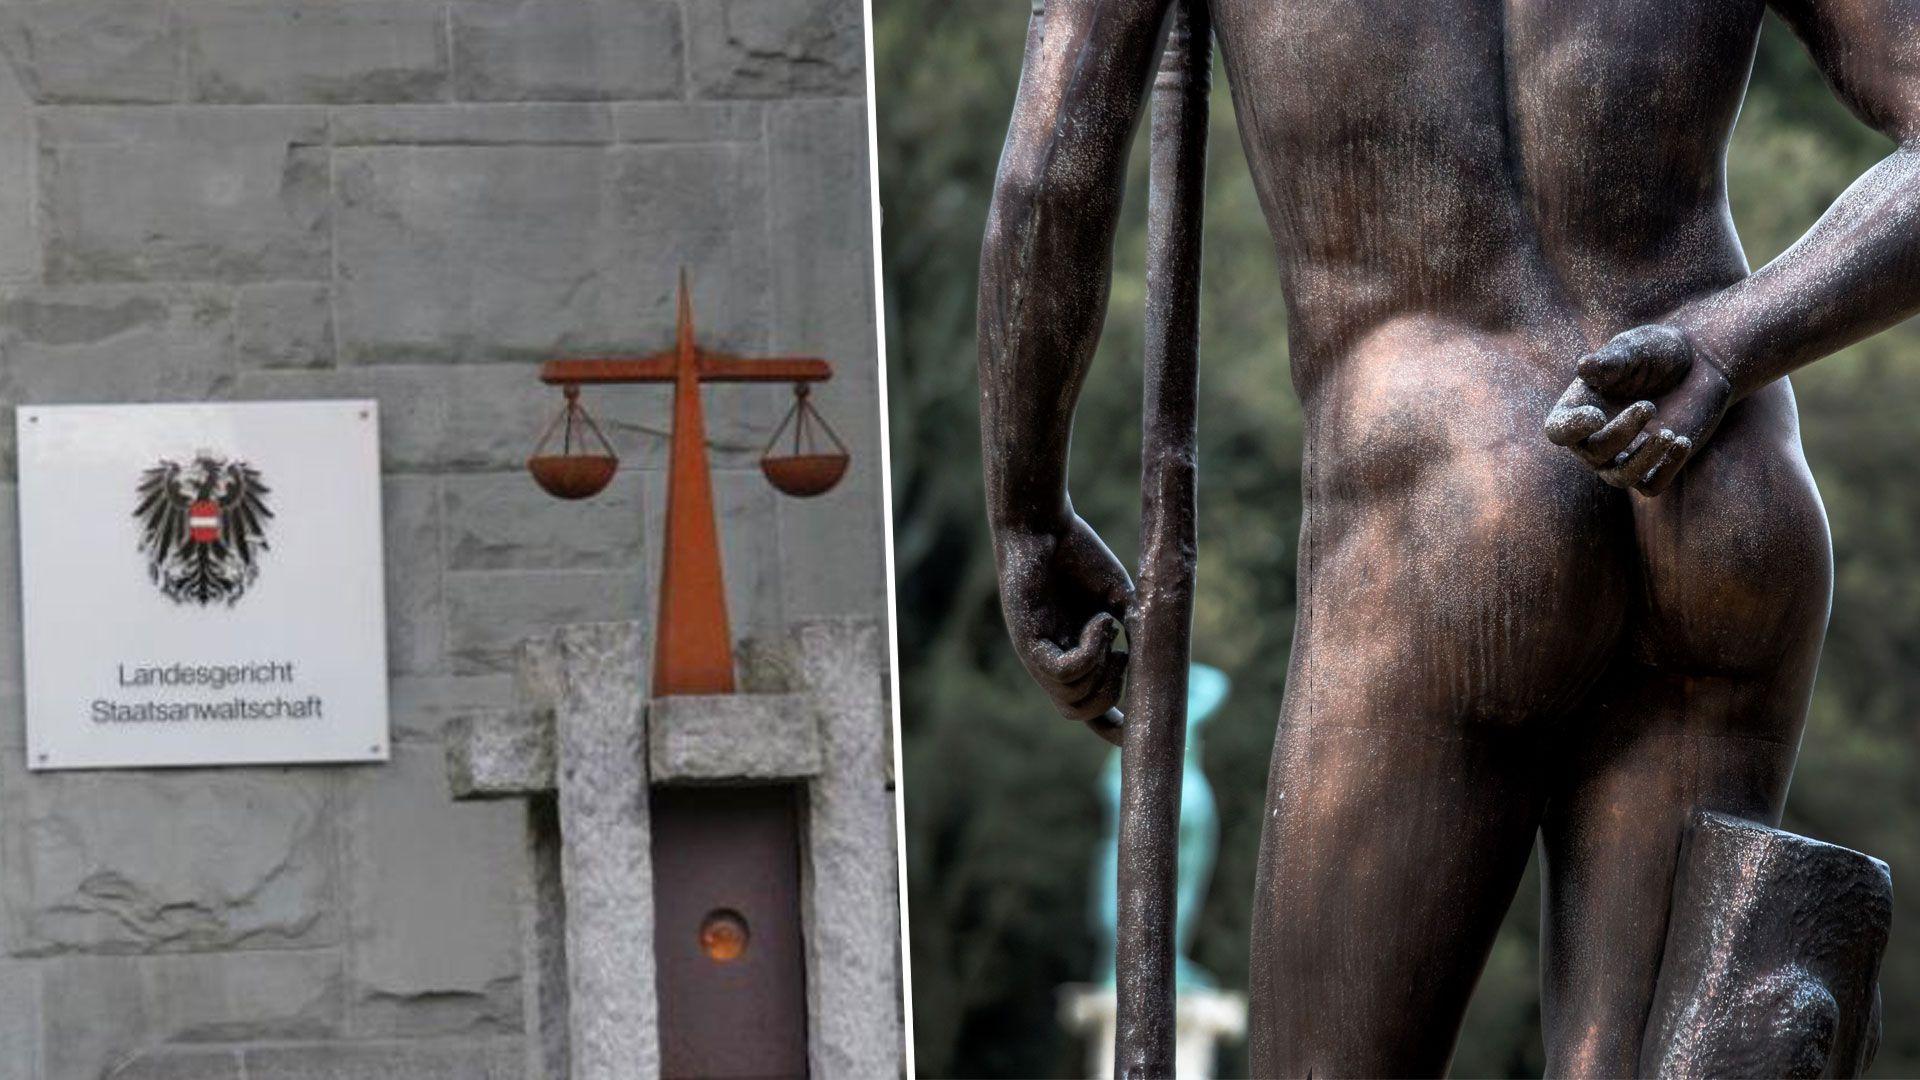 Klage: Penis durch Beschneidung verkürzt